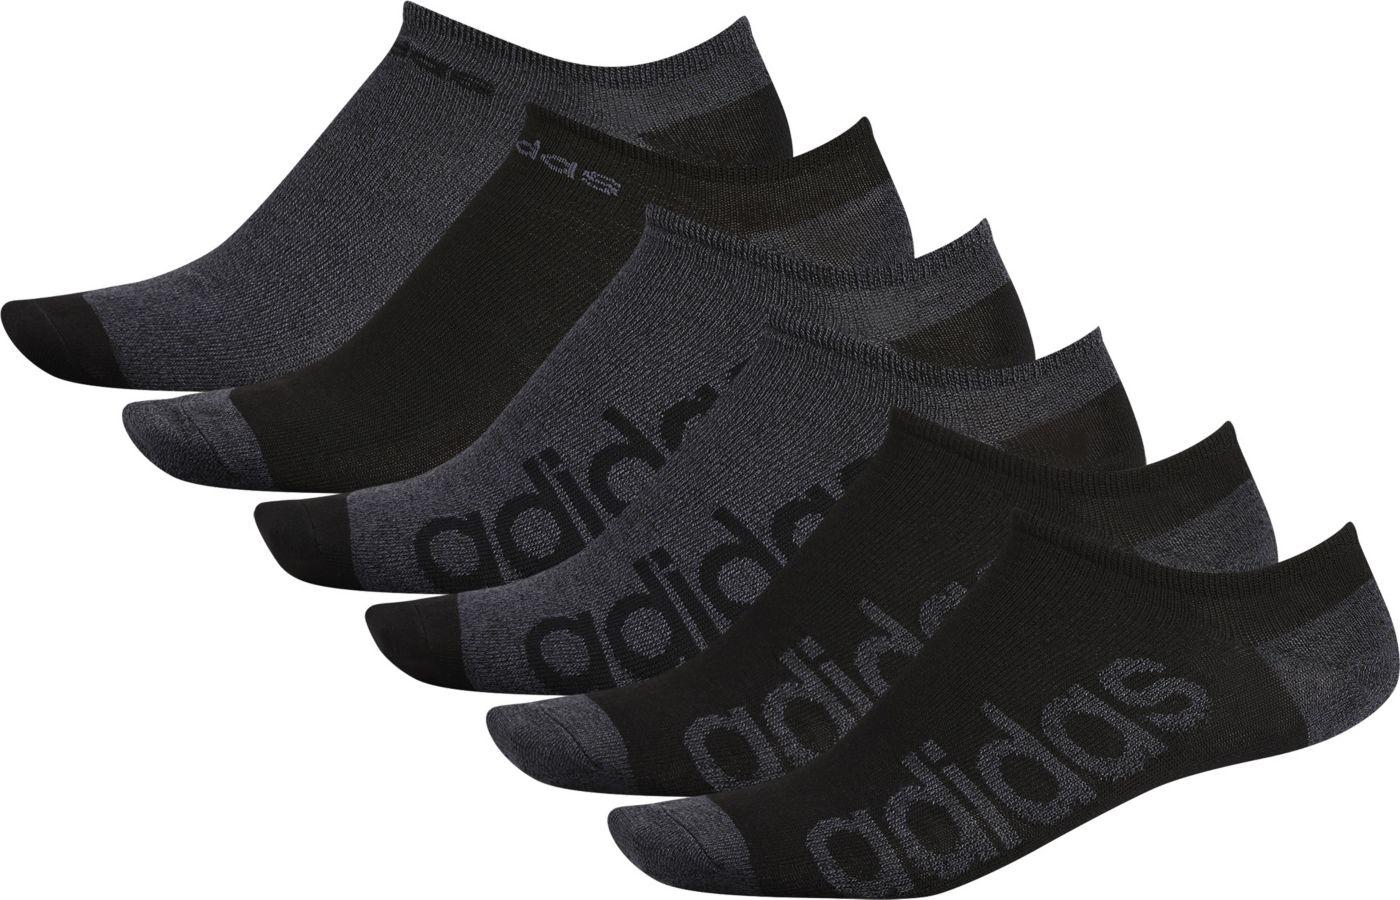 adidas Men's Superlite Linear No-Show Socks - 6 Pack